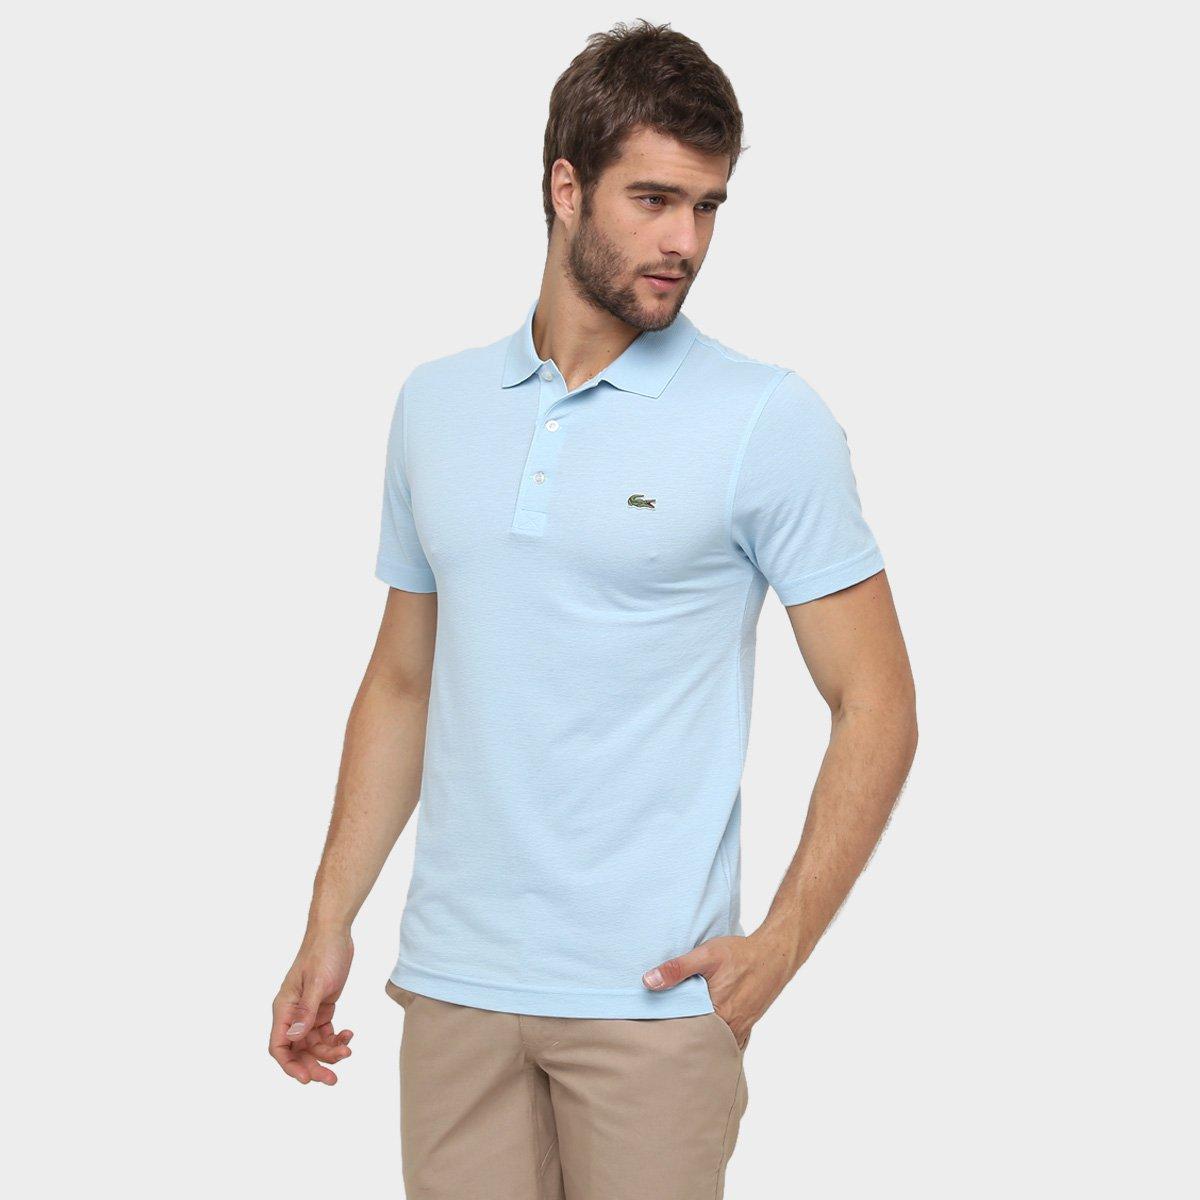 ee085bf7443ab Camisa Polo Lacoste Super Light Masculina - Azul Claro e Preto ...